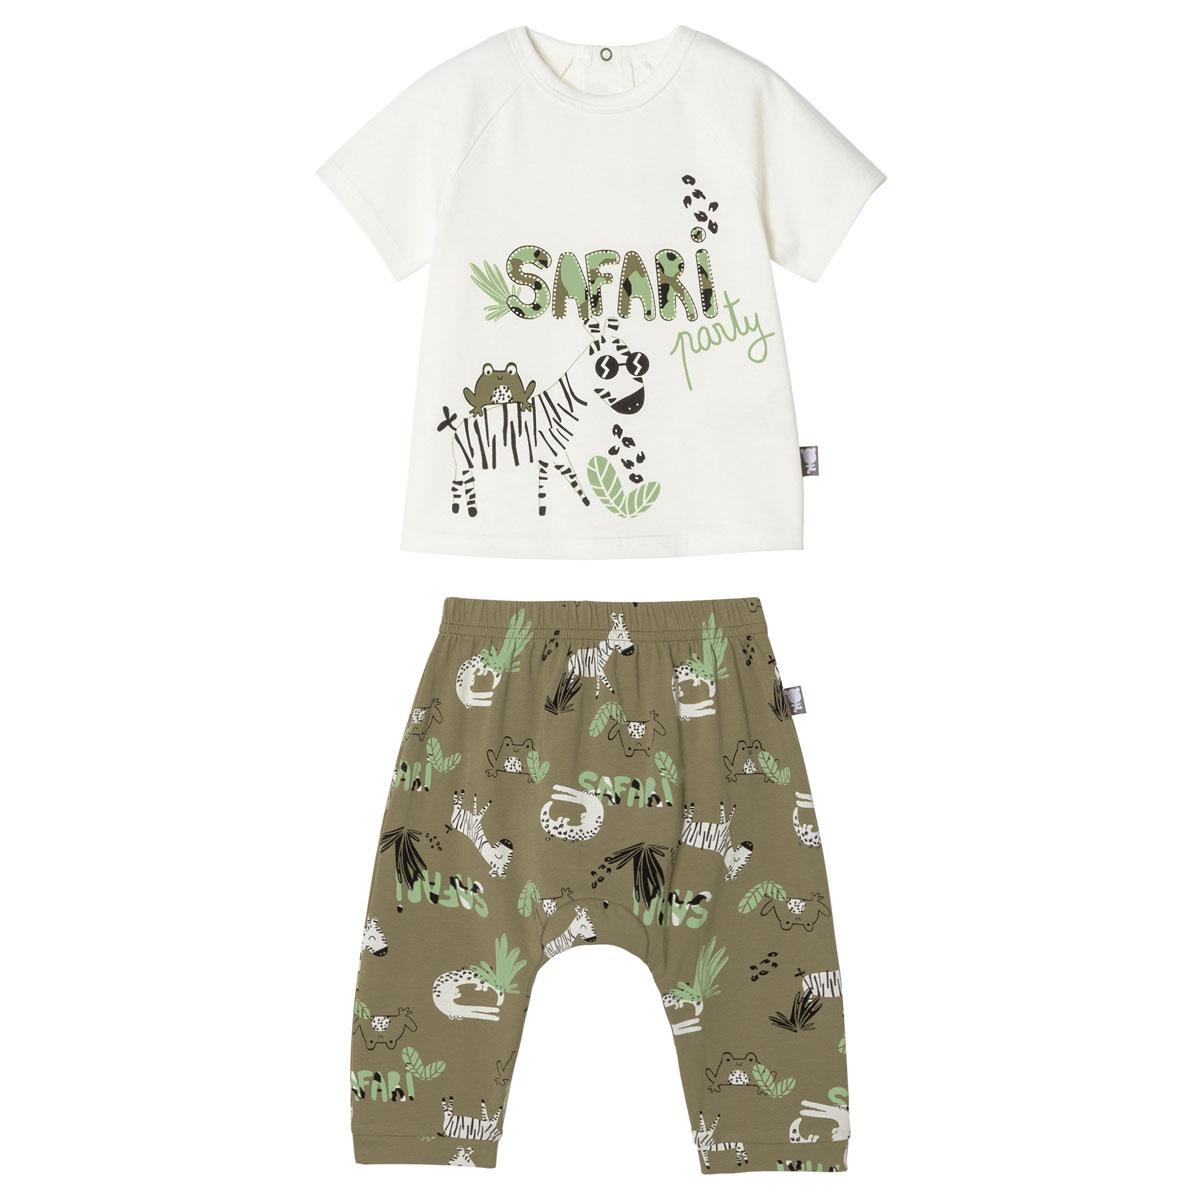 Ensemble bébé garçon t-shirt + sarouel Nerobi